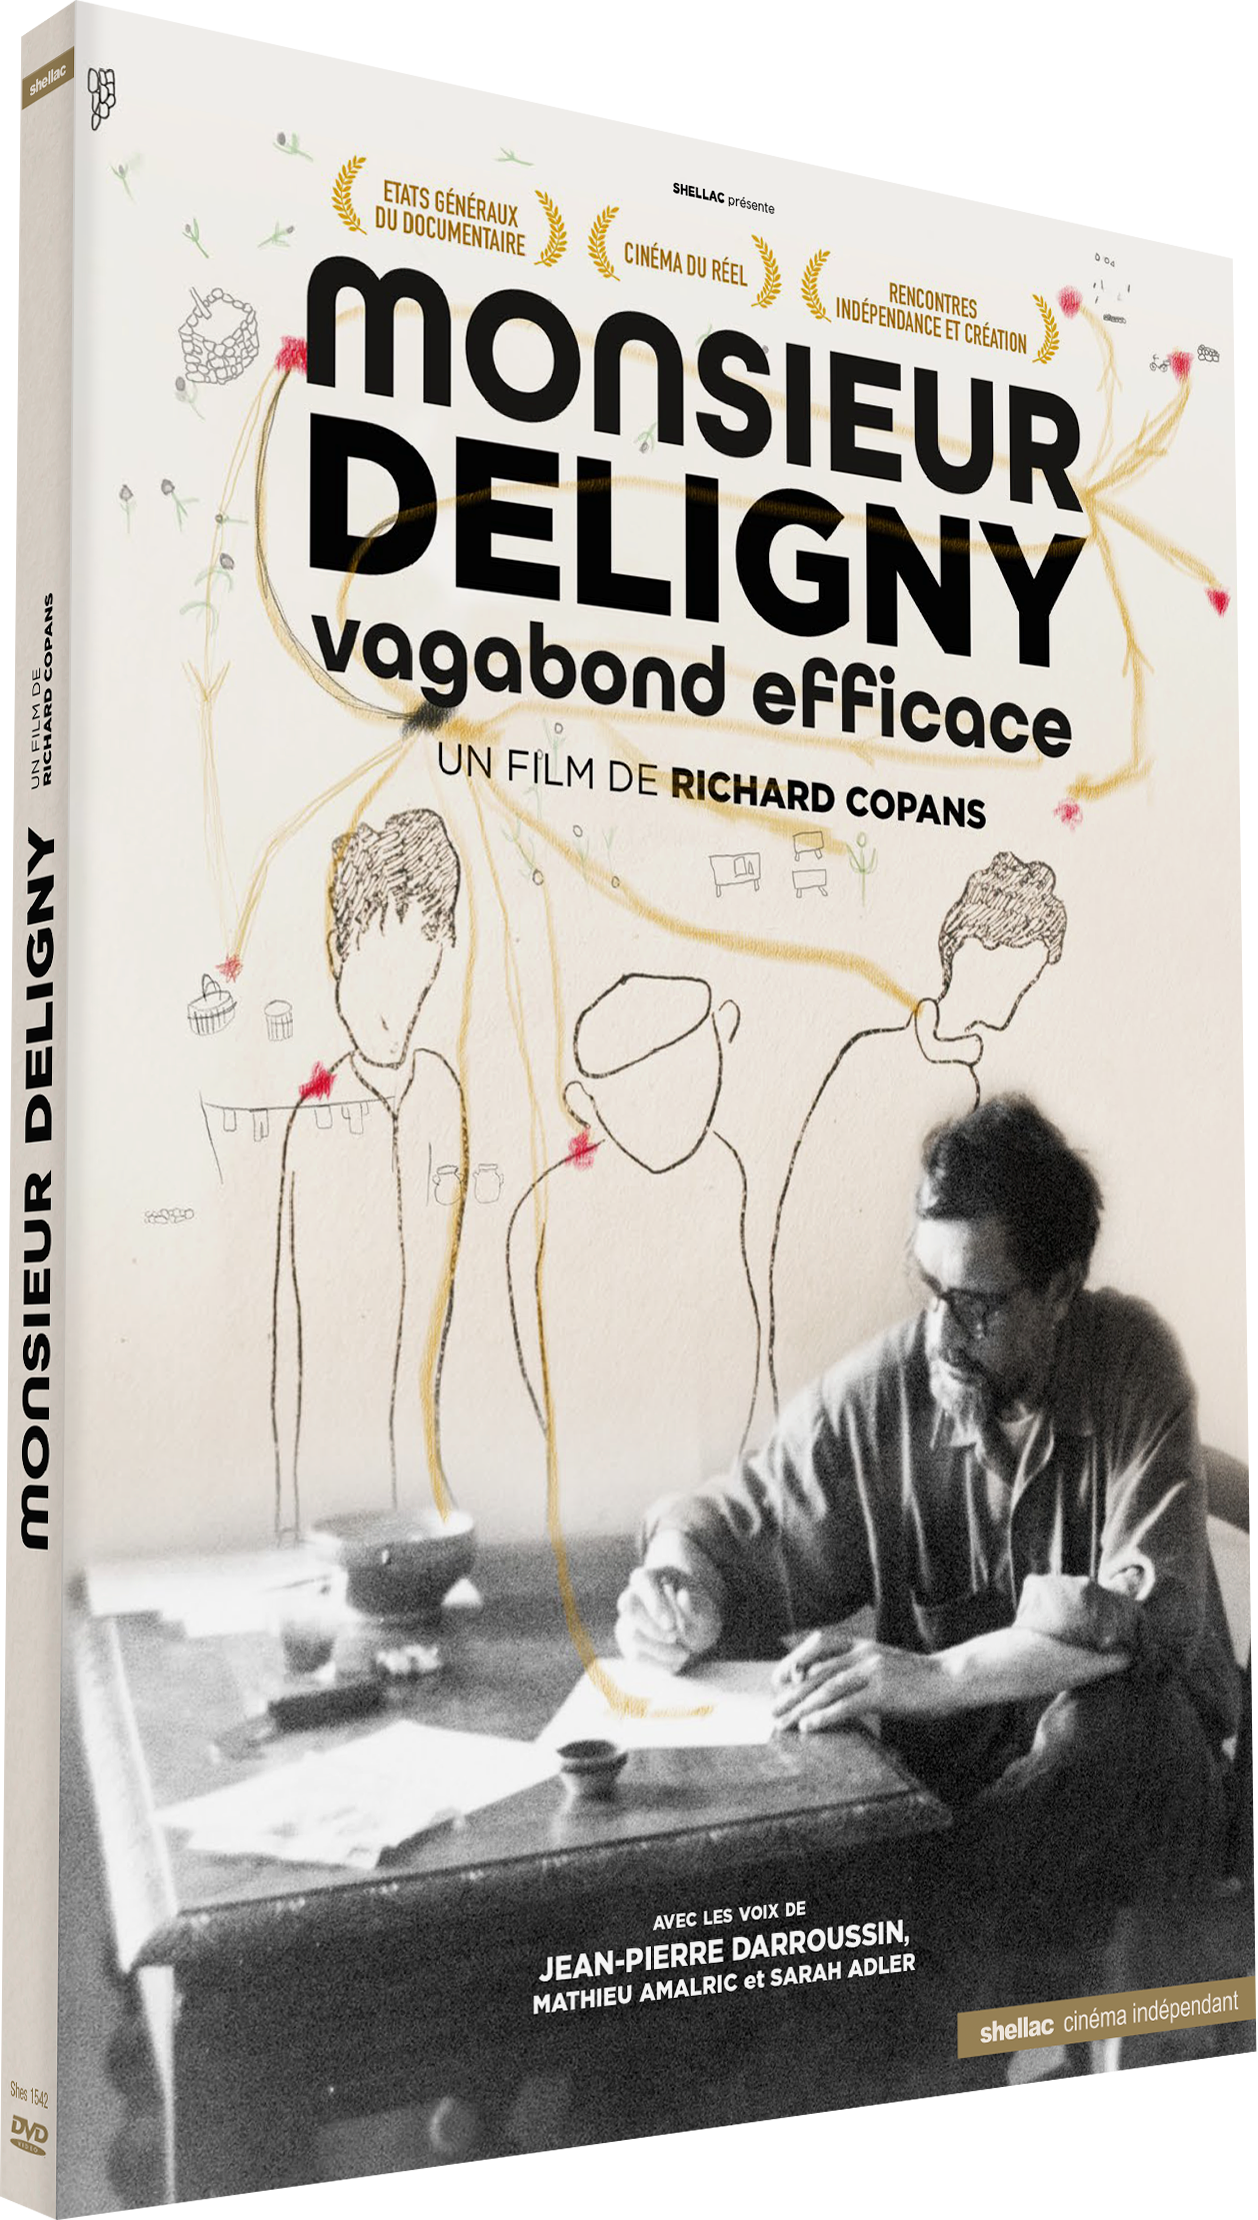 shellac-monsieur-deligny-vagabond-efficace-packshot-3185.png